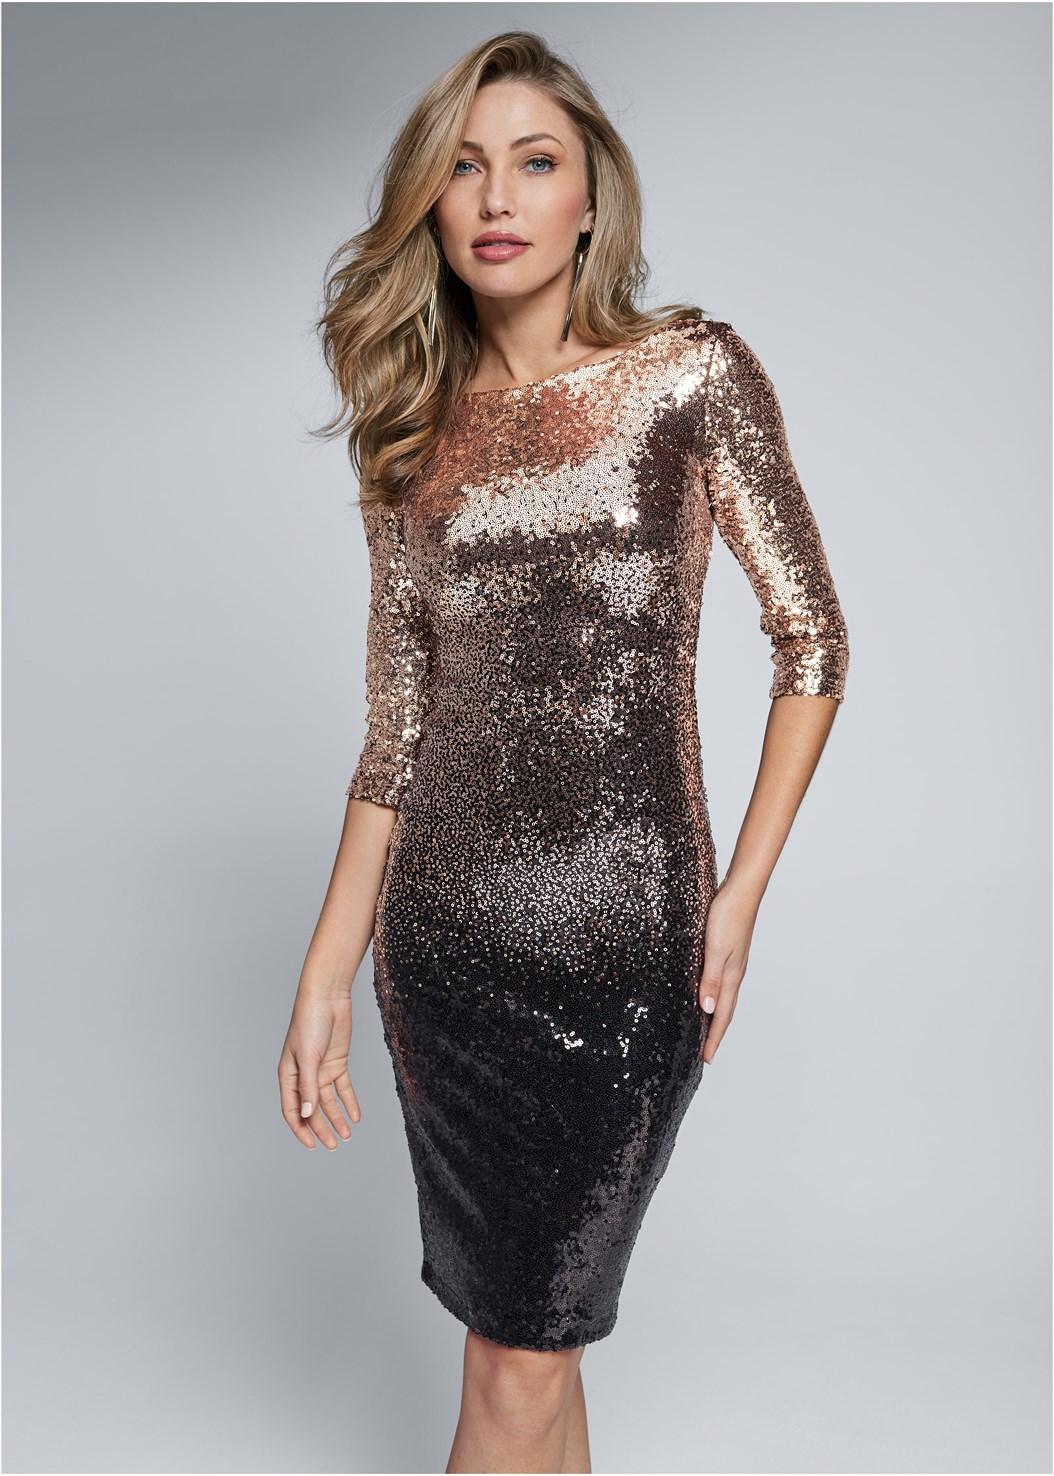 Ombre Sequin Dress,Kissable Convertible Bra,Shadow Stripe Heels,Mix Metal Tassel Earring